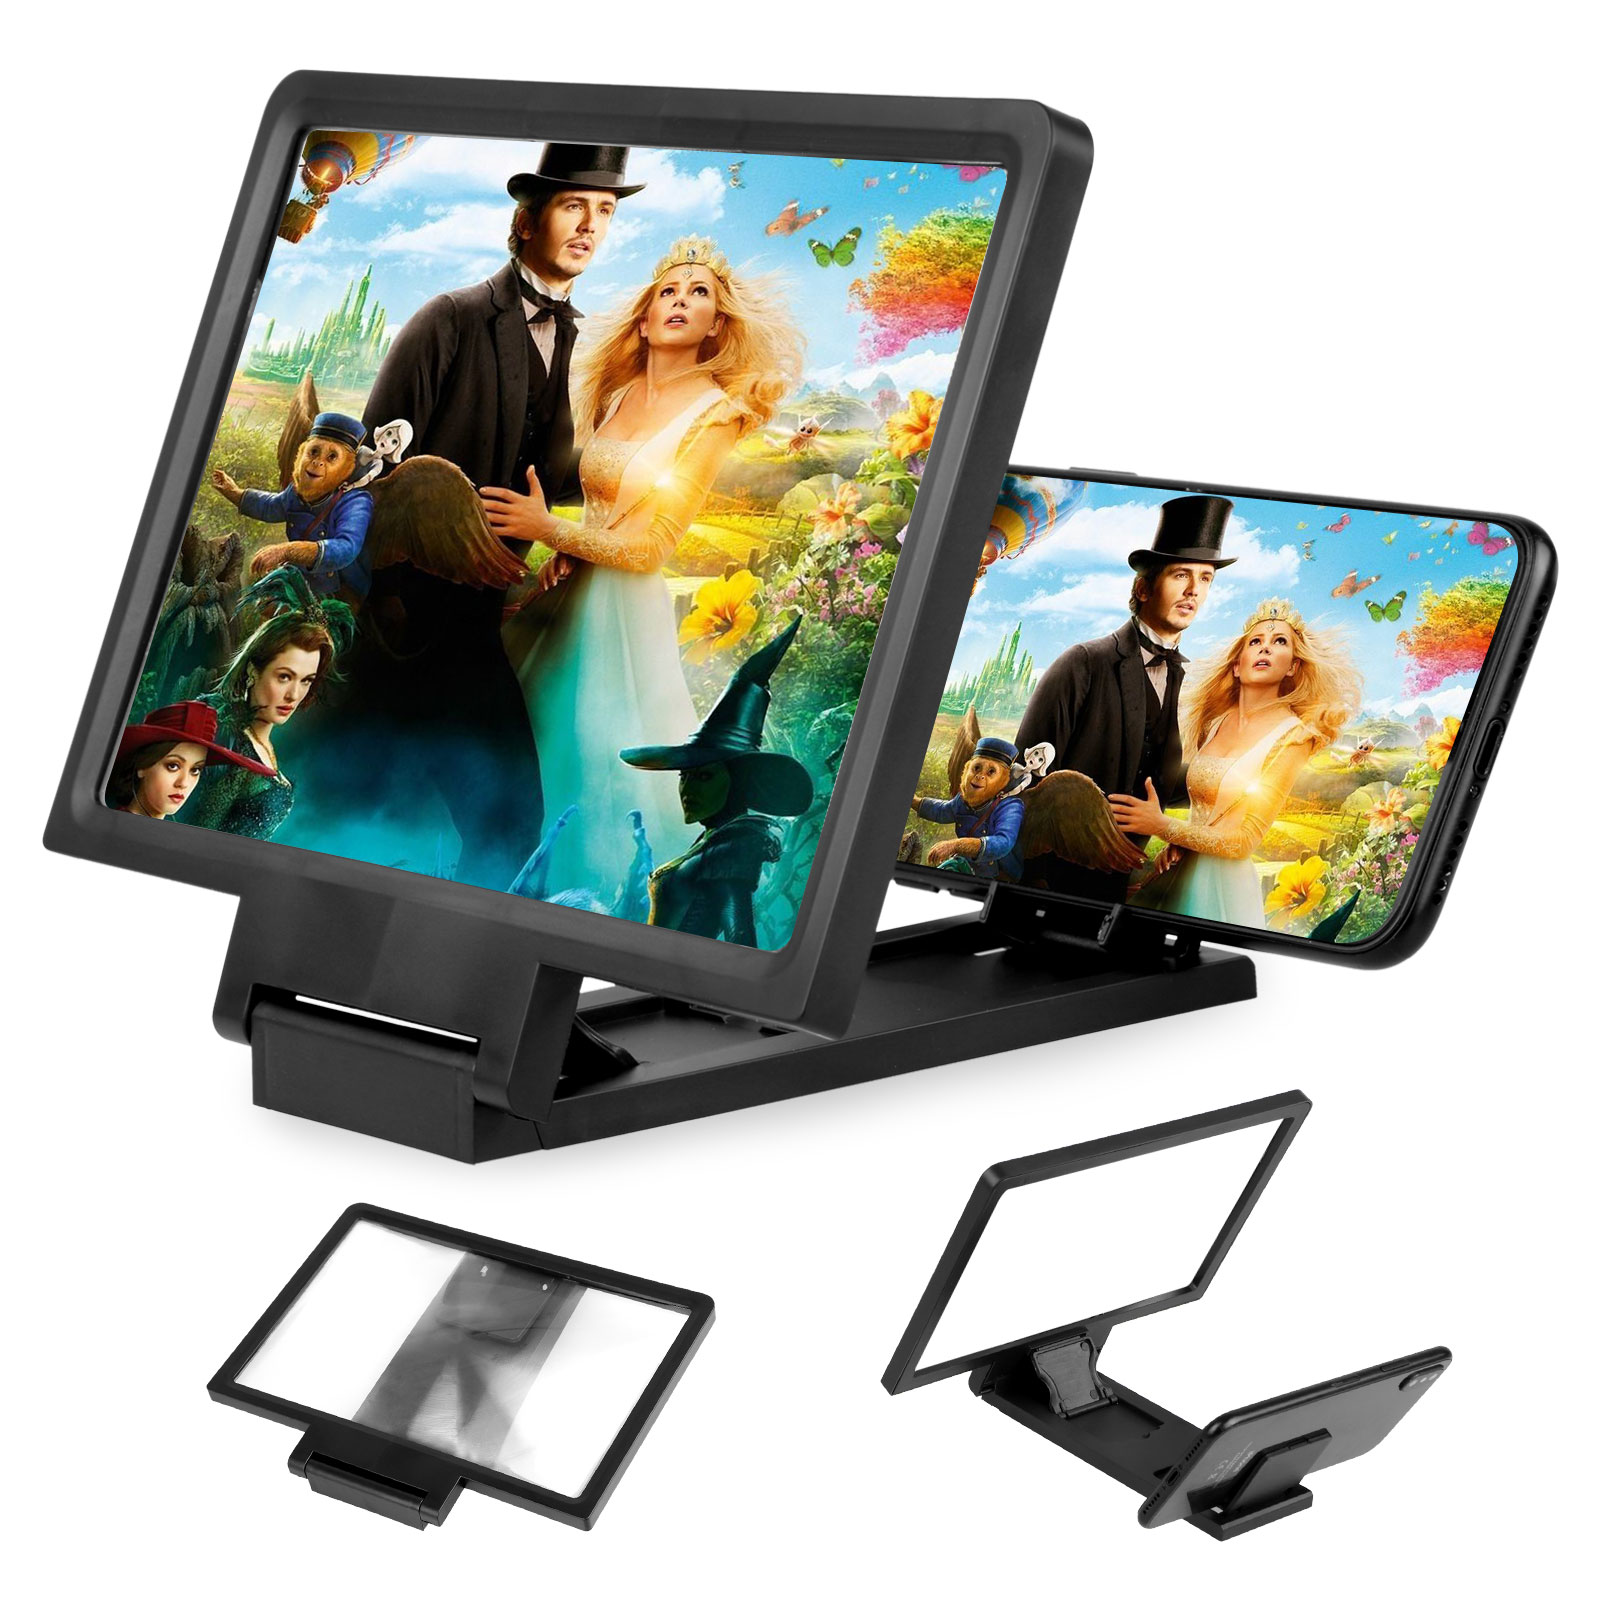 Hongyuantongxun Mobile Phone Screen Amplifier Smart Phone Universal HD Screen Amplifier Folding Stand 3D Chase Drama Watching Artifact Anti-Fatigue Black 16.710.7cm,Clear Picture